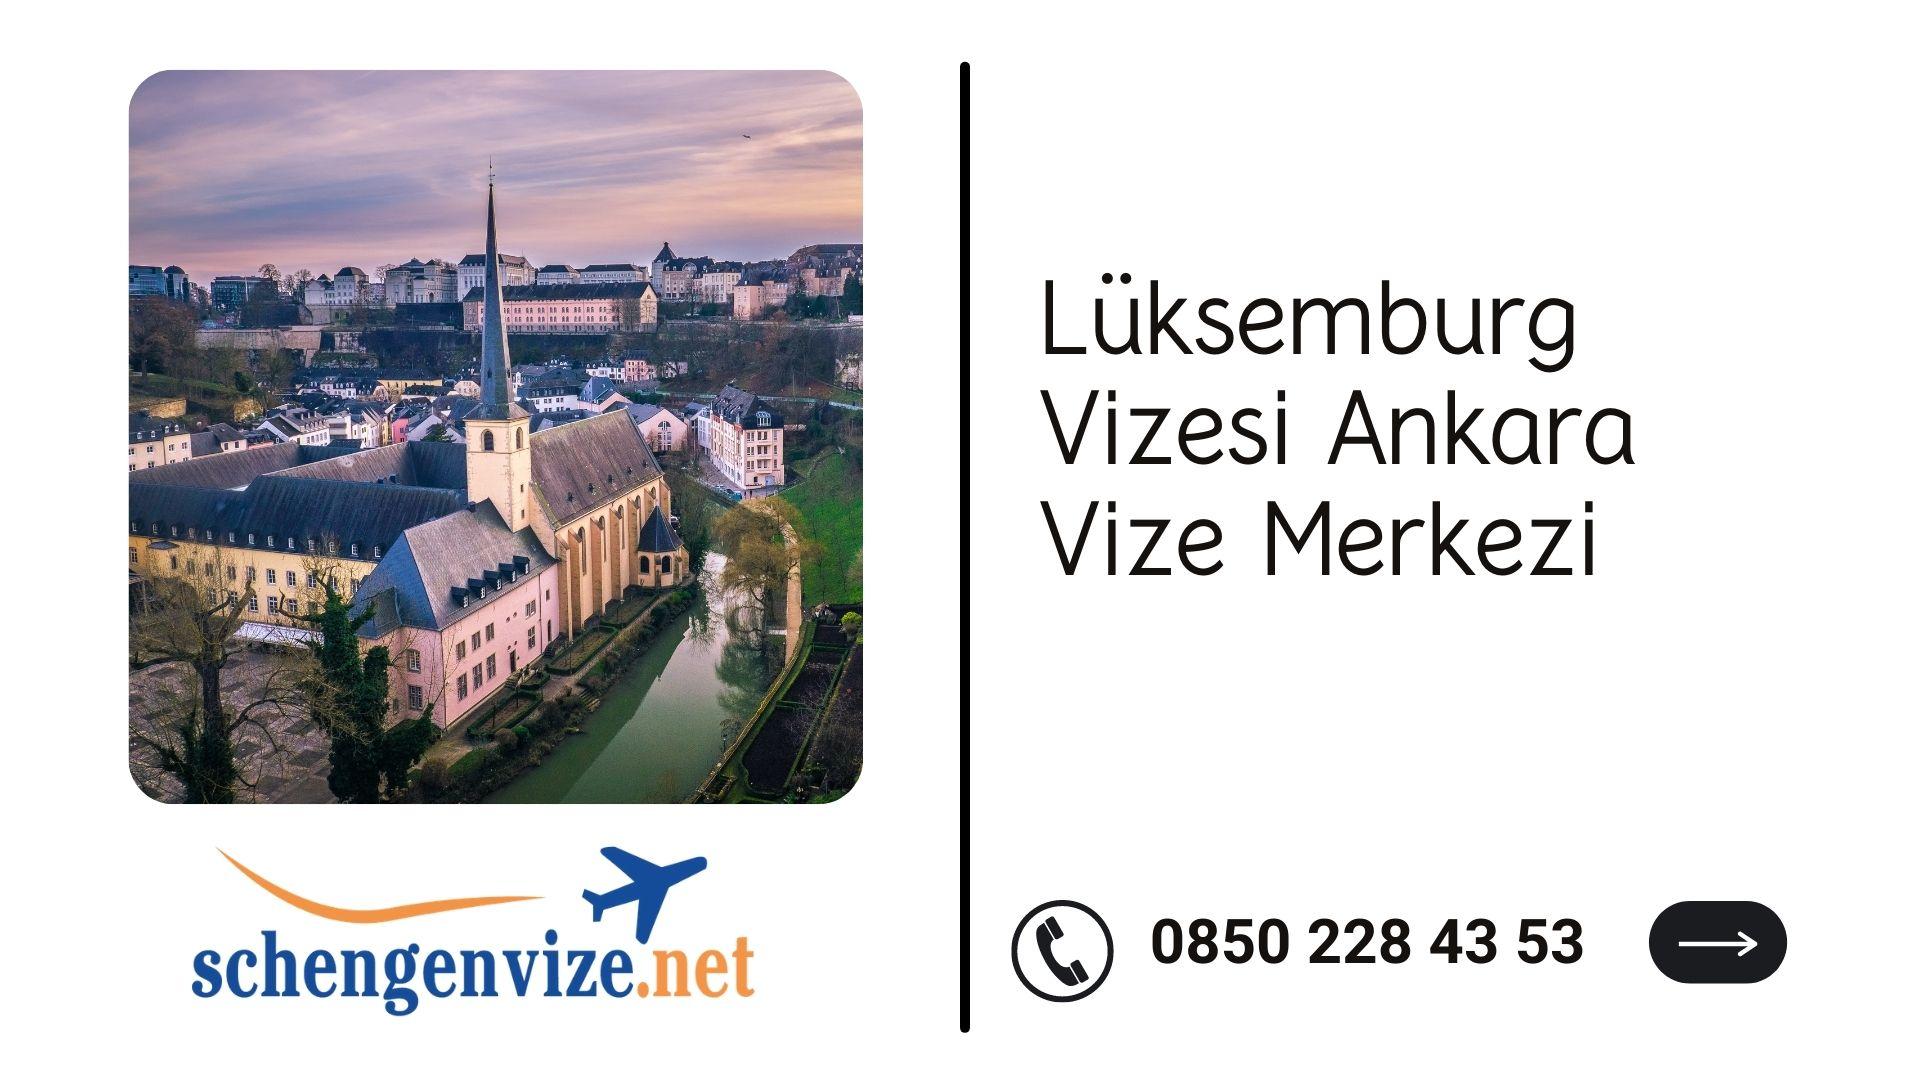 Lüksemburg Vizesi Ankara Vize Merkezi